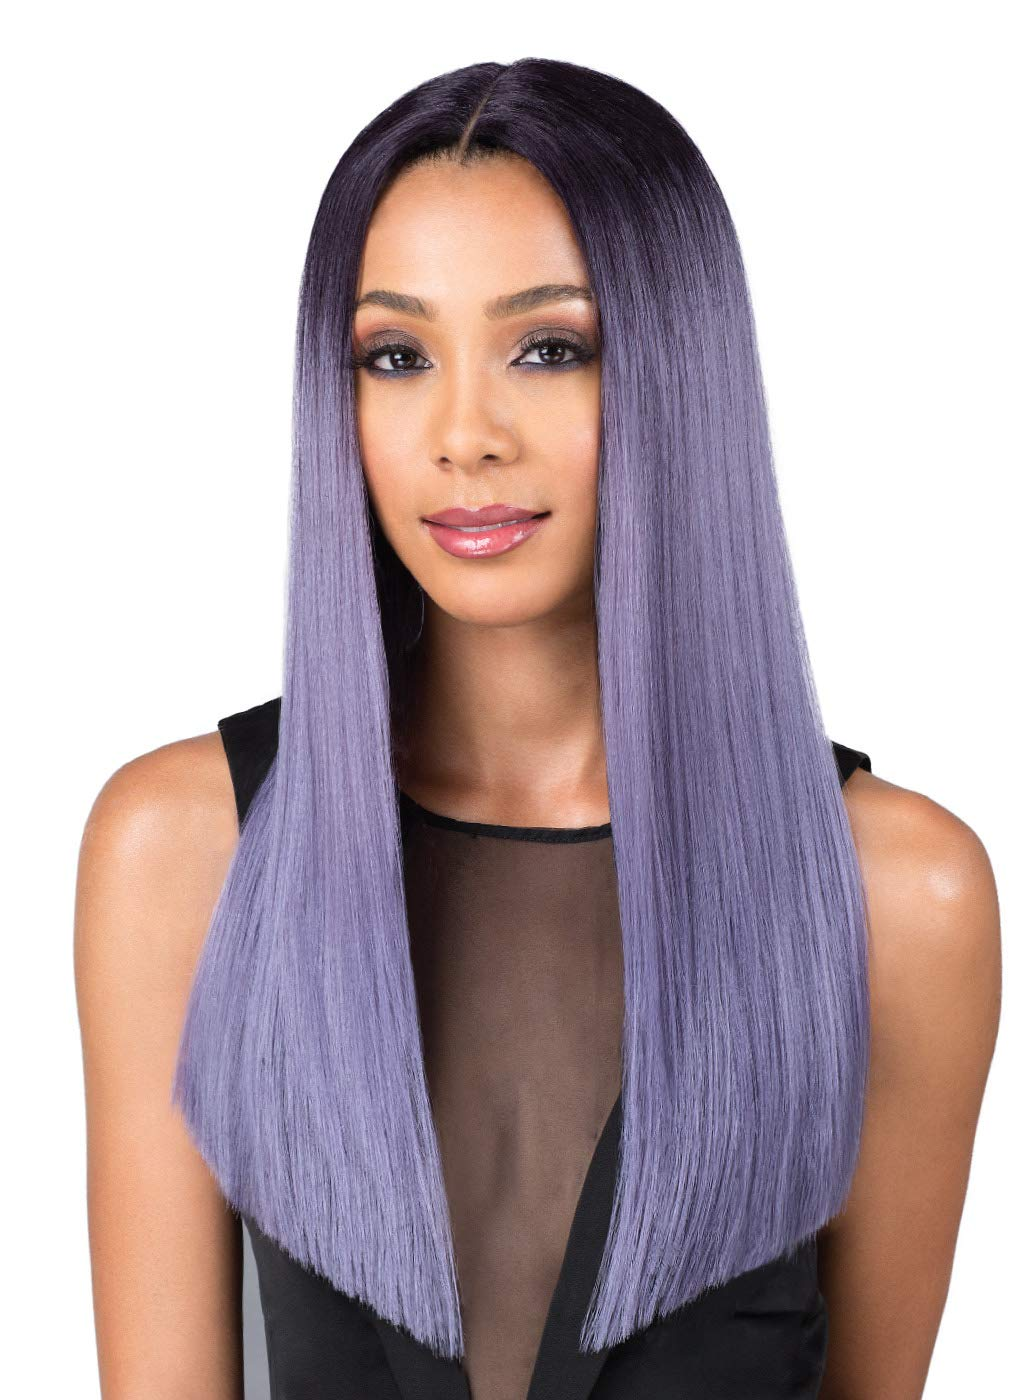 Bobbi Boss Premium Synthetic Swiss Lace Wig 売店 LO MLF202 YARA 安心の実績 高価 買取 強化中 Front